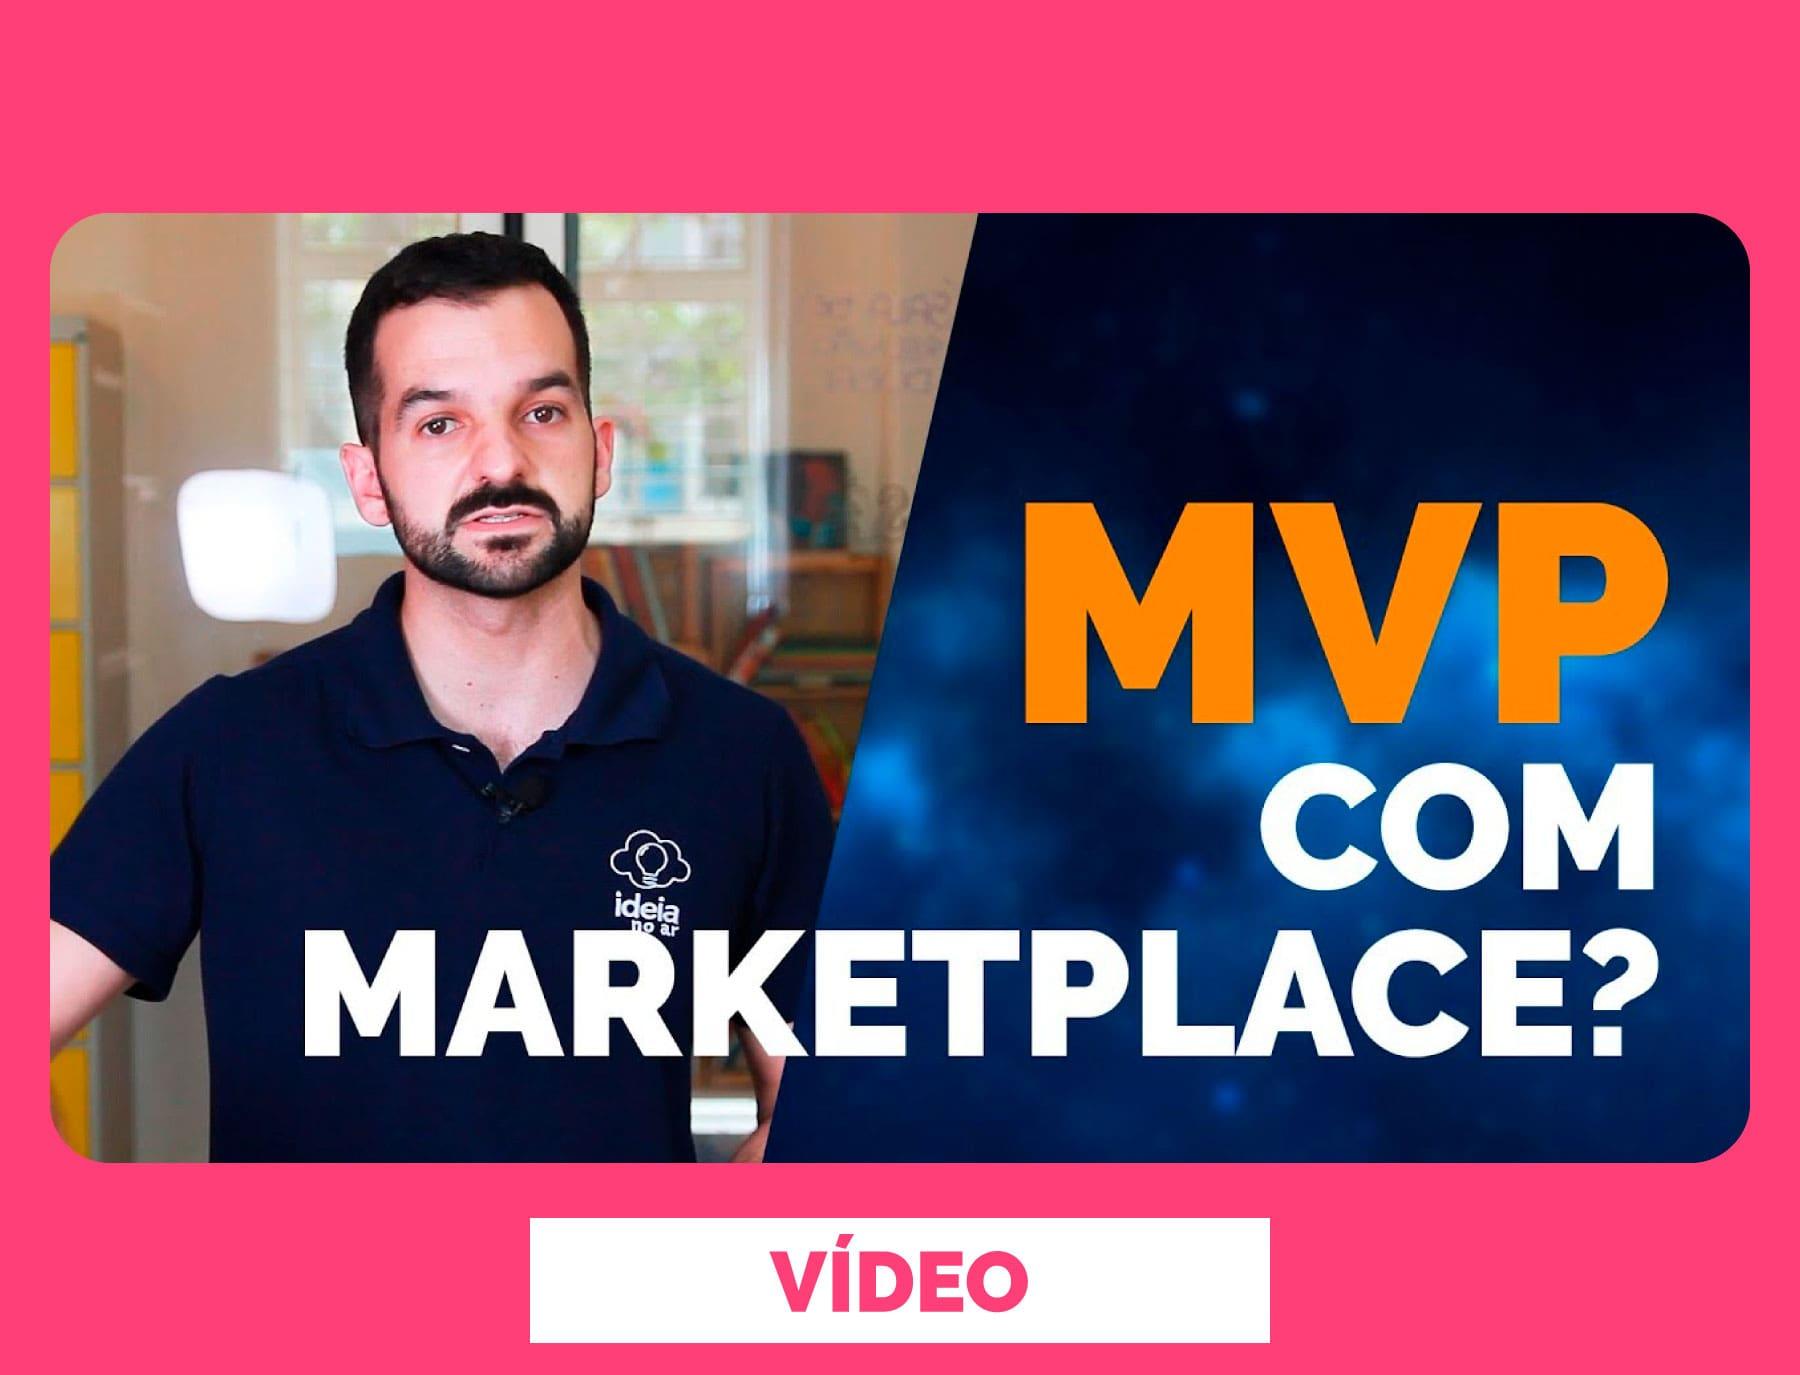 mvp-com-marketplace